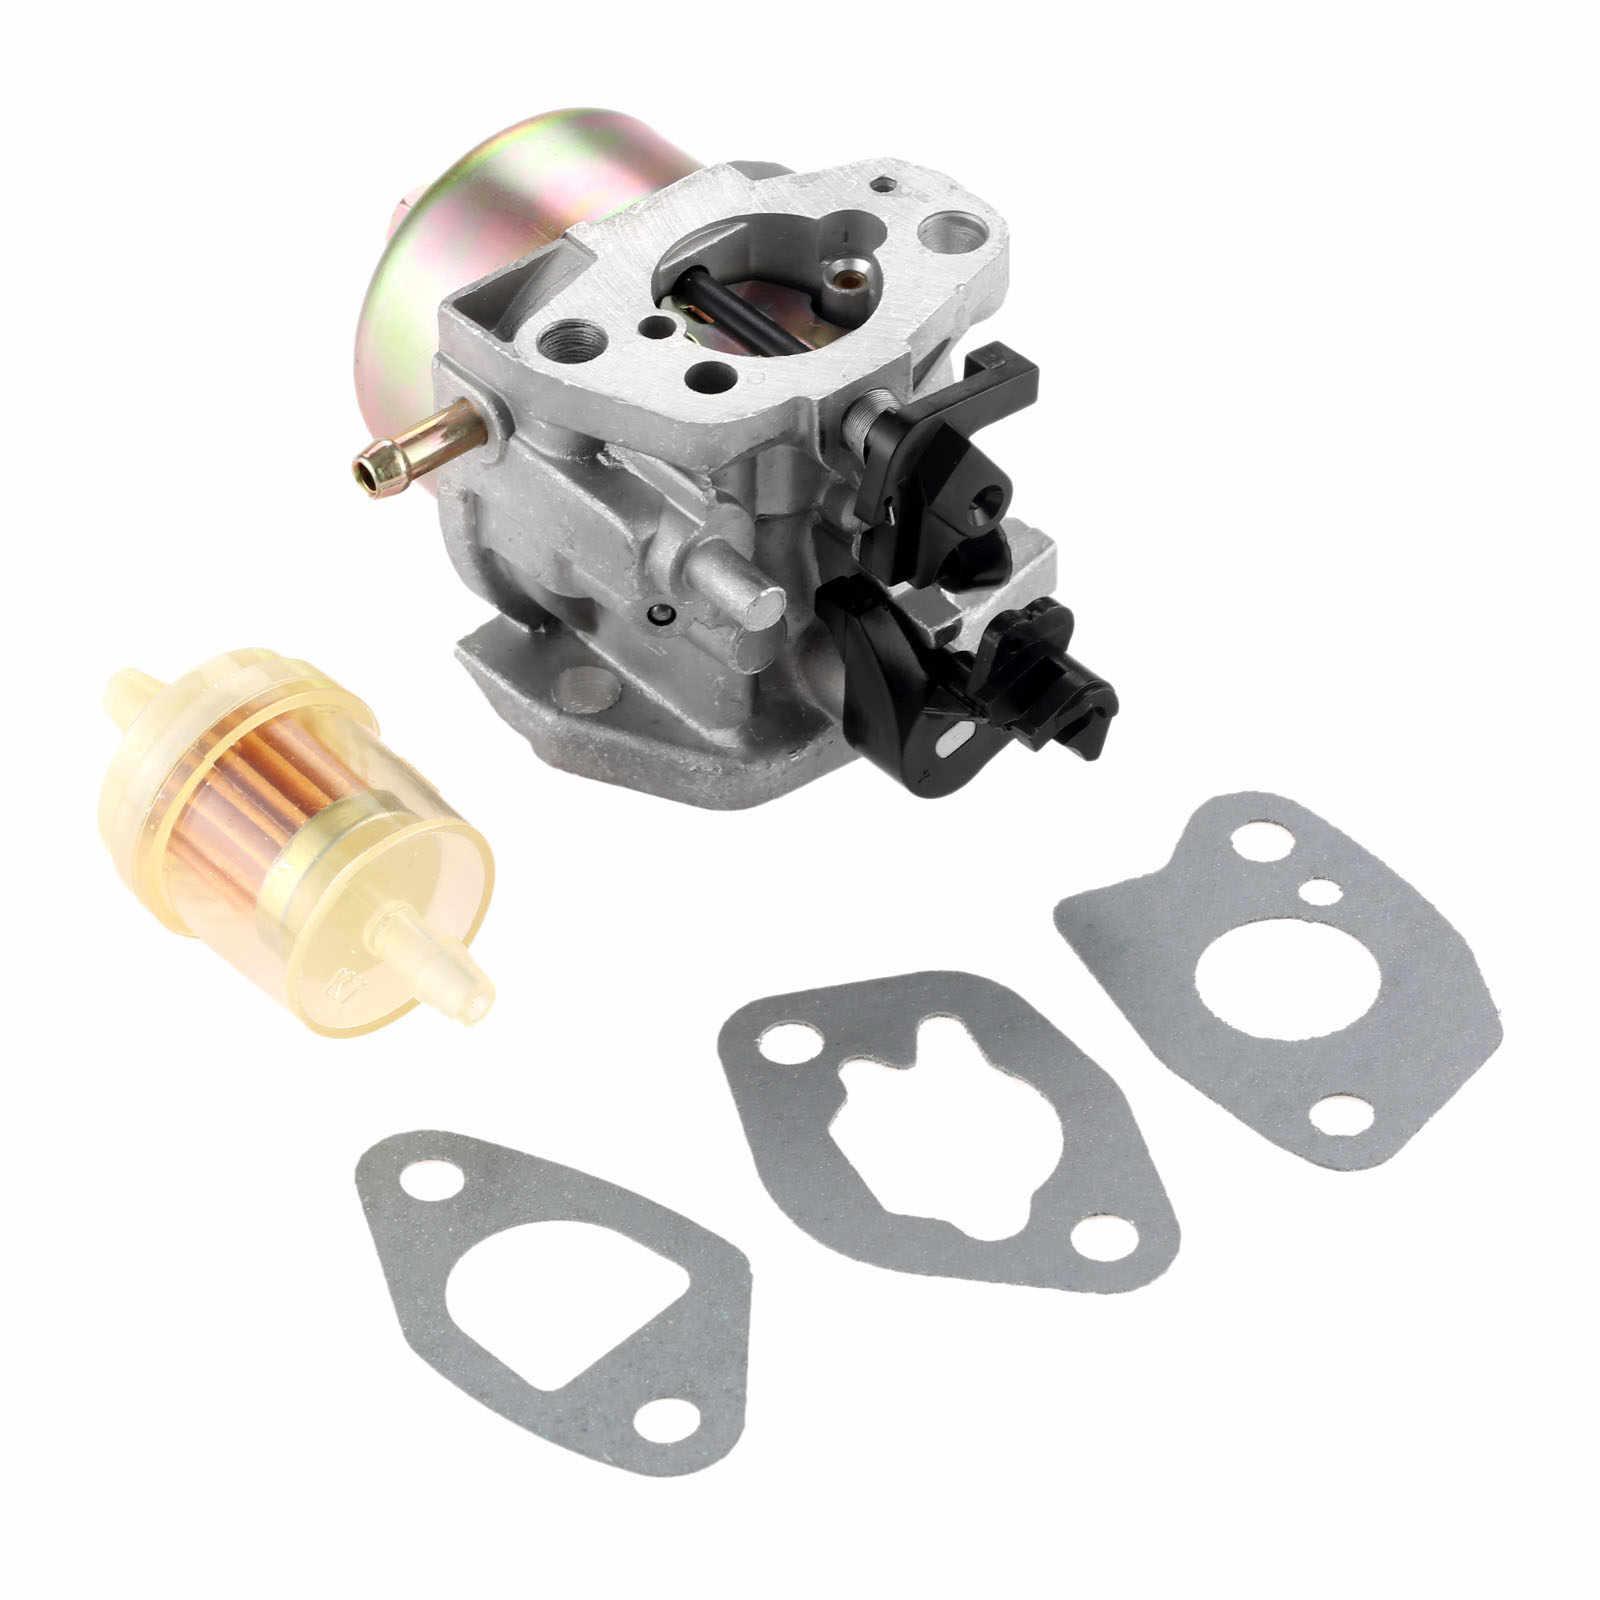 small resolution of  dreld carburetor with carburetor gasket fuel filter for mtd cub cadet troy bilt lawn mower